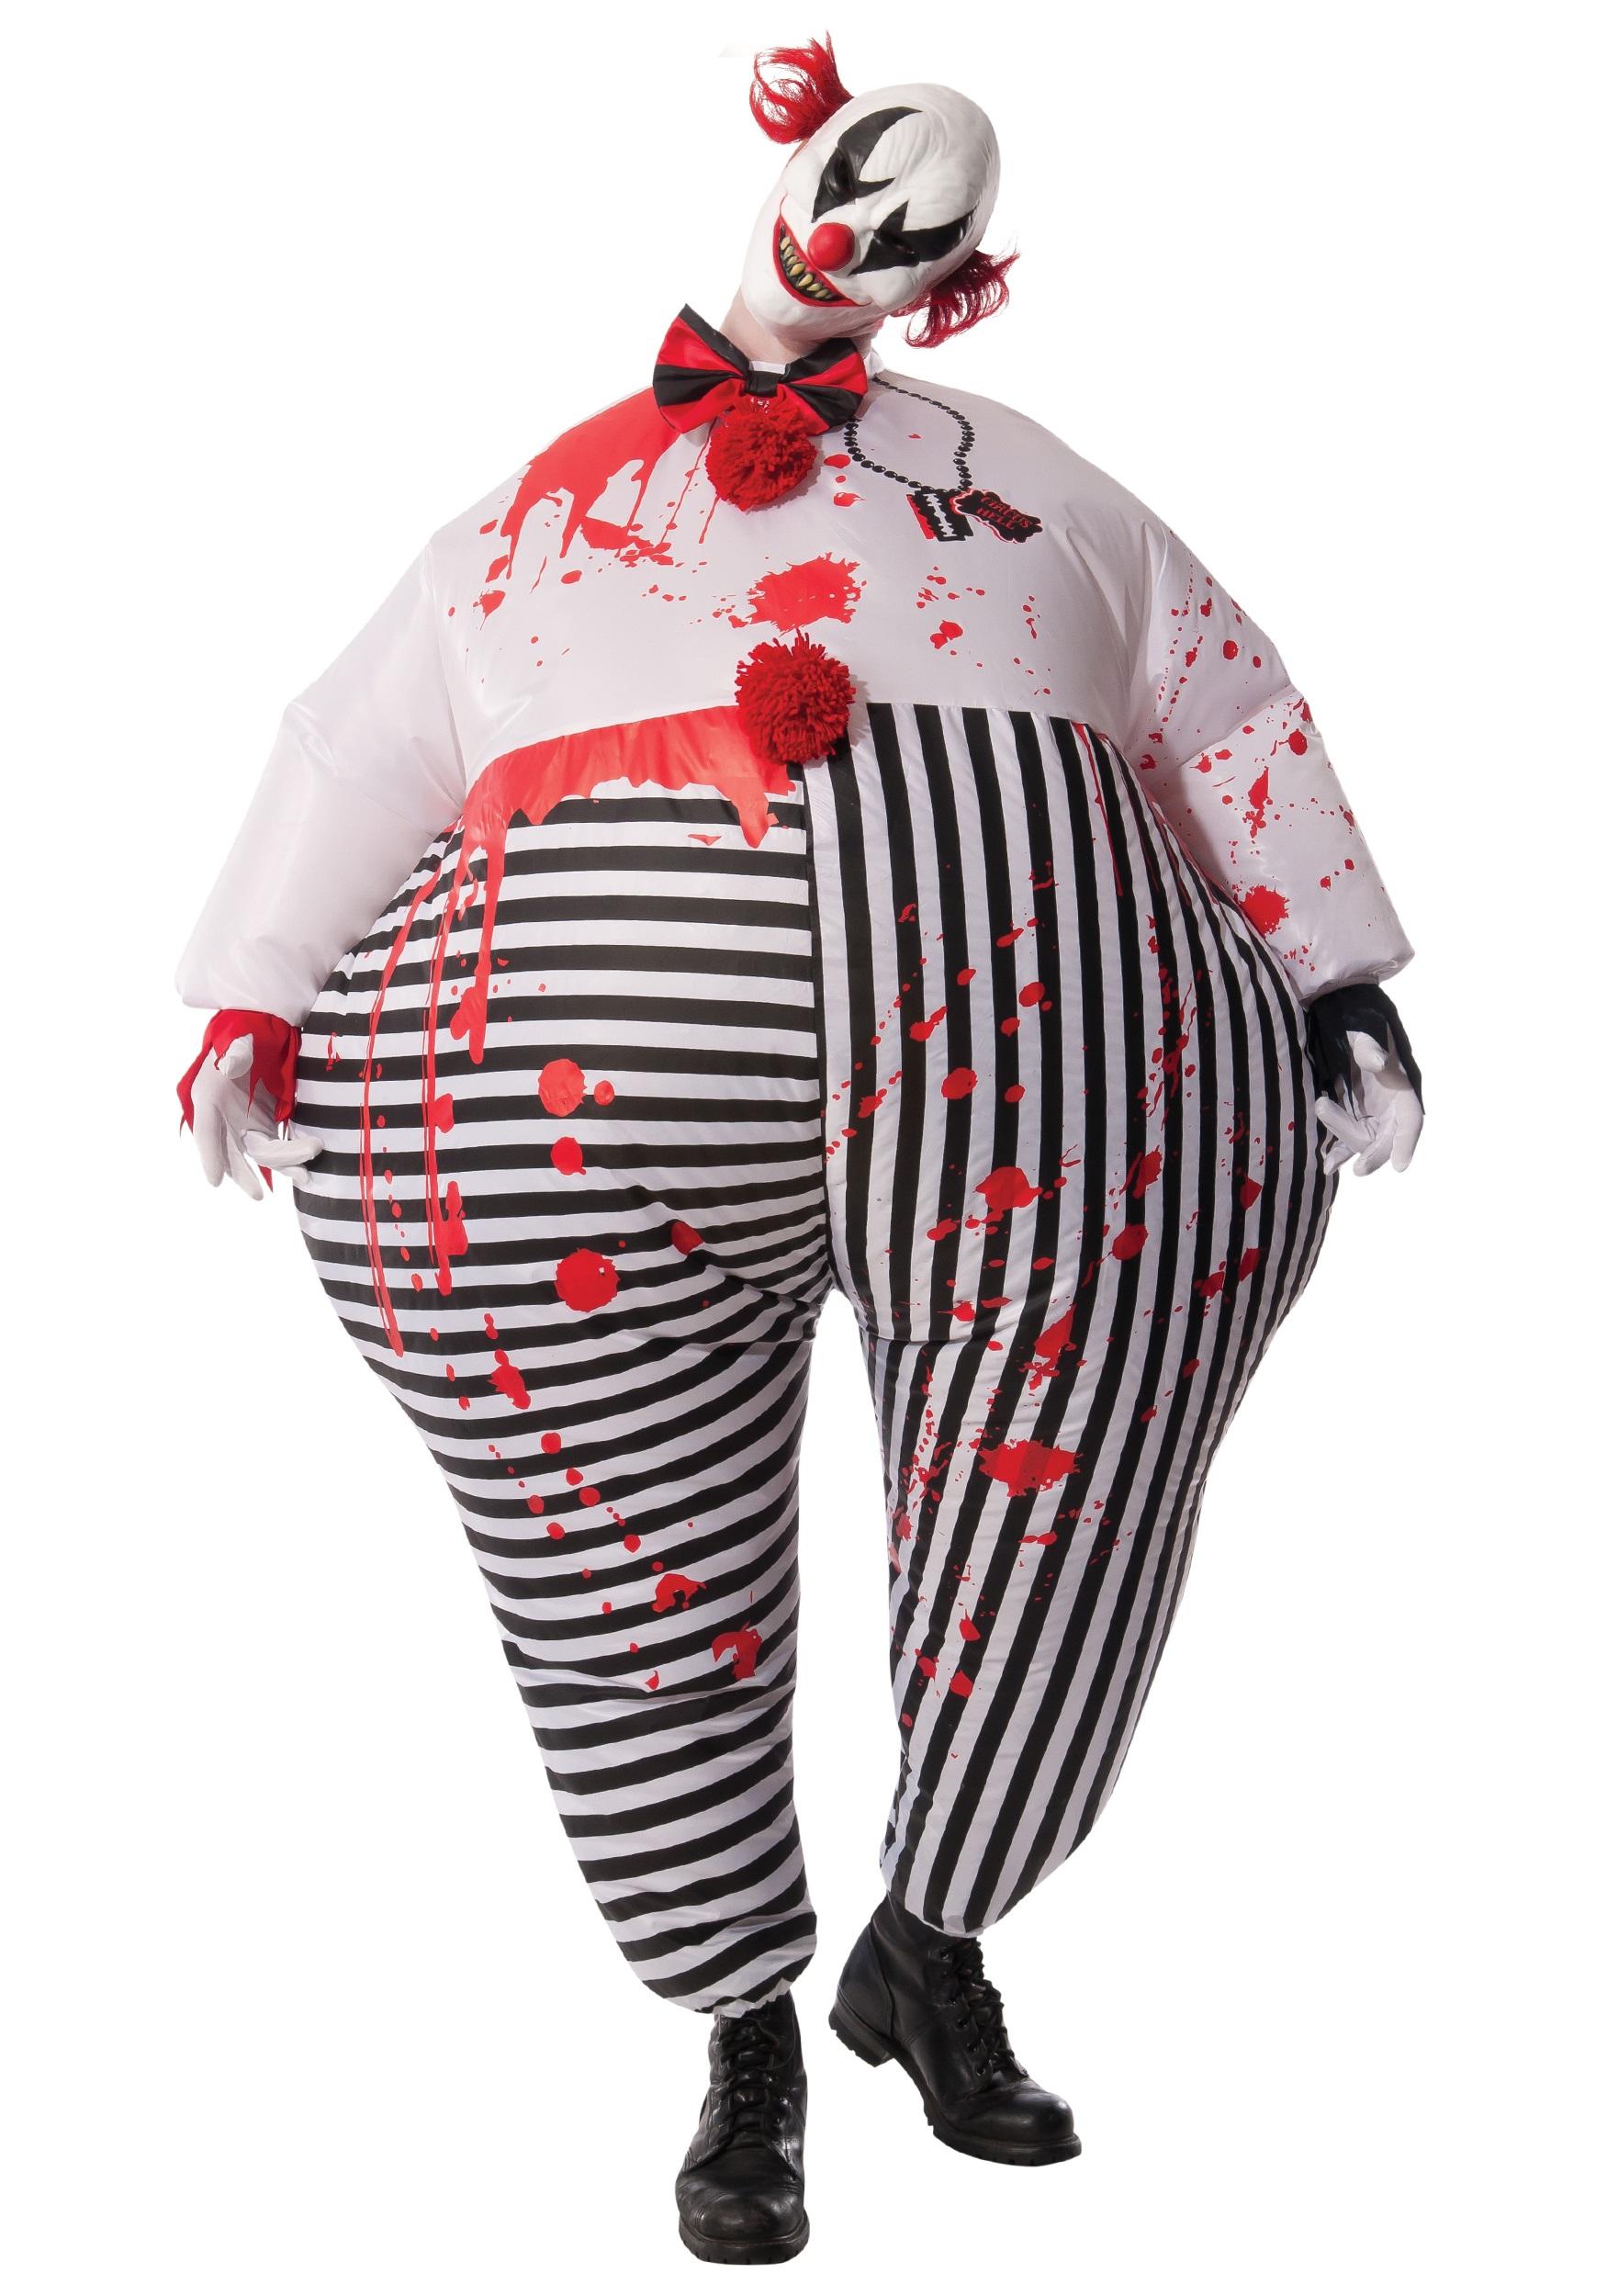 Adult Inflatable Evil Clown Costume  sc 1 st  Fun.com & Adultu0027s Inflatable Evil Clown Costume